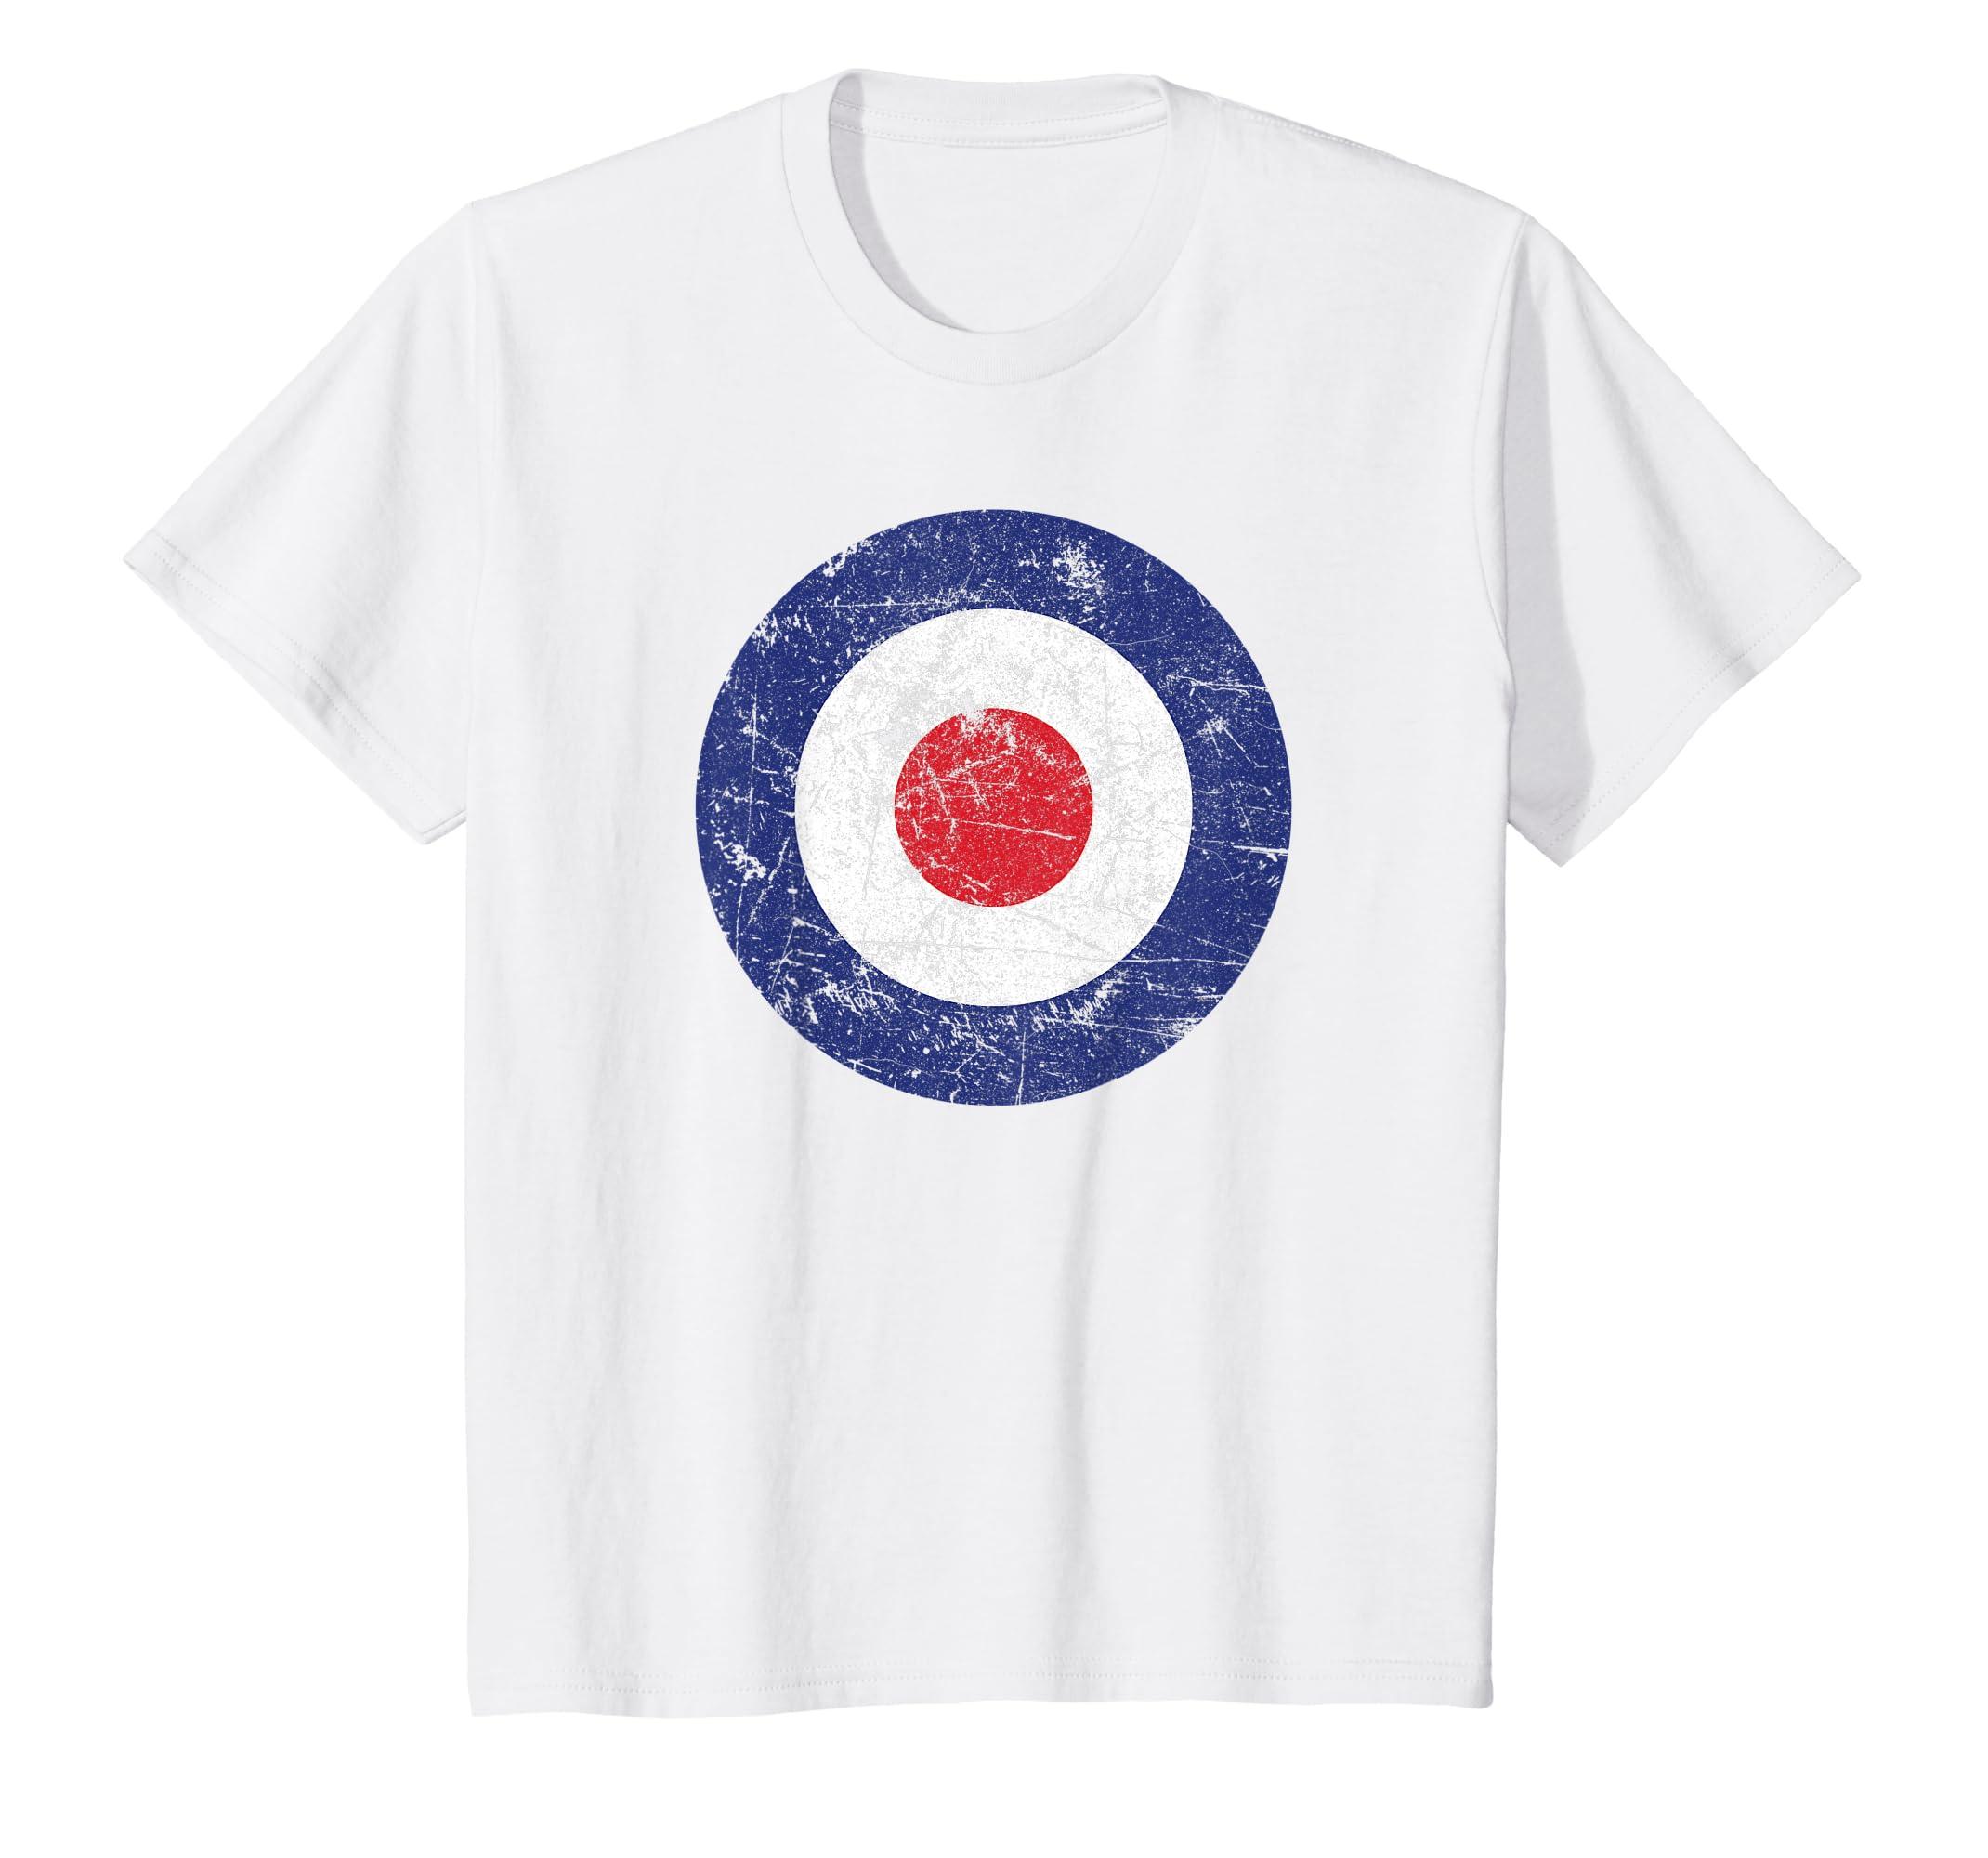 sports shoes dce6e d2b2a Distressed Target Bullseye British RAF Roundel T-Shirt